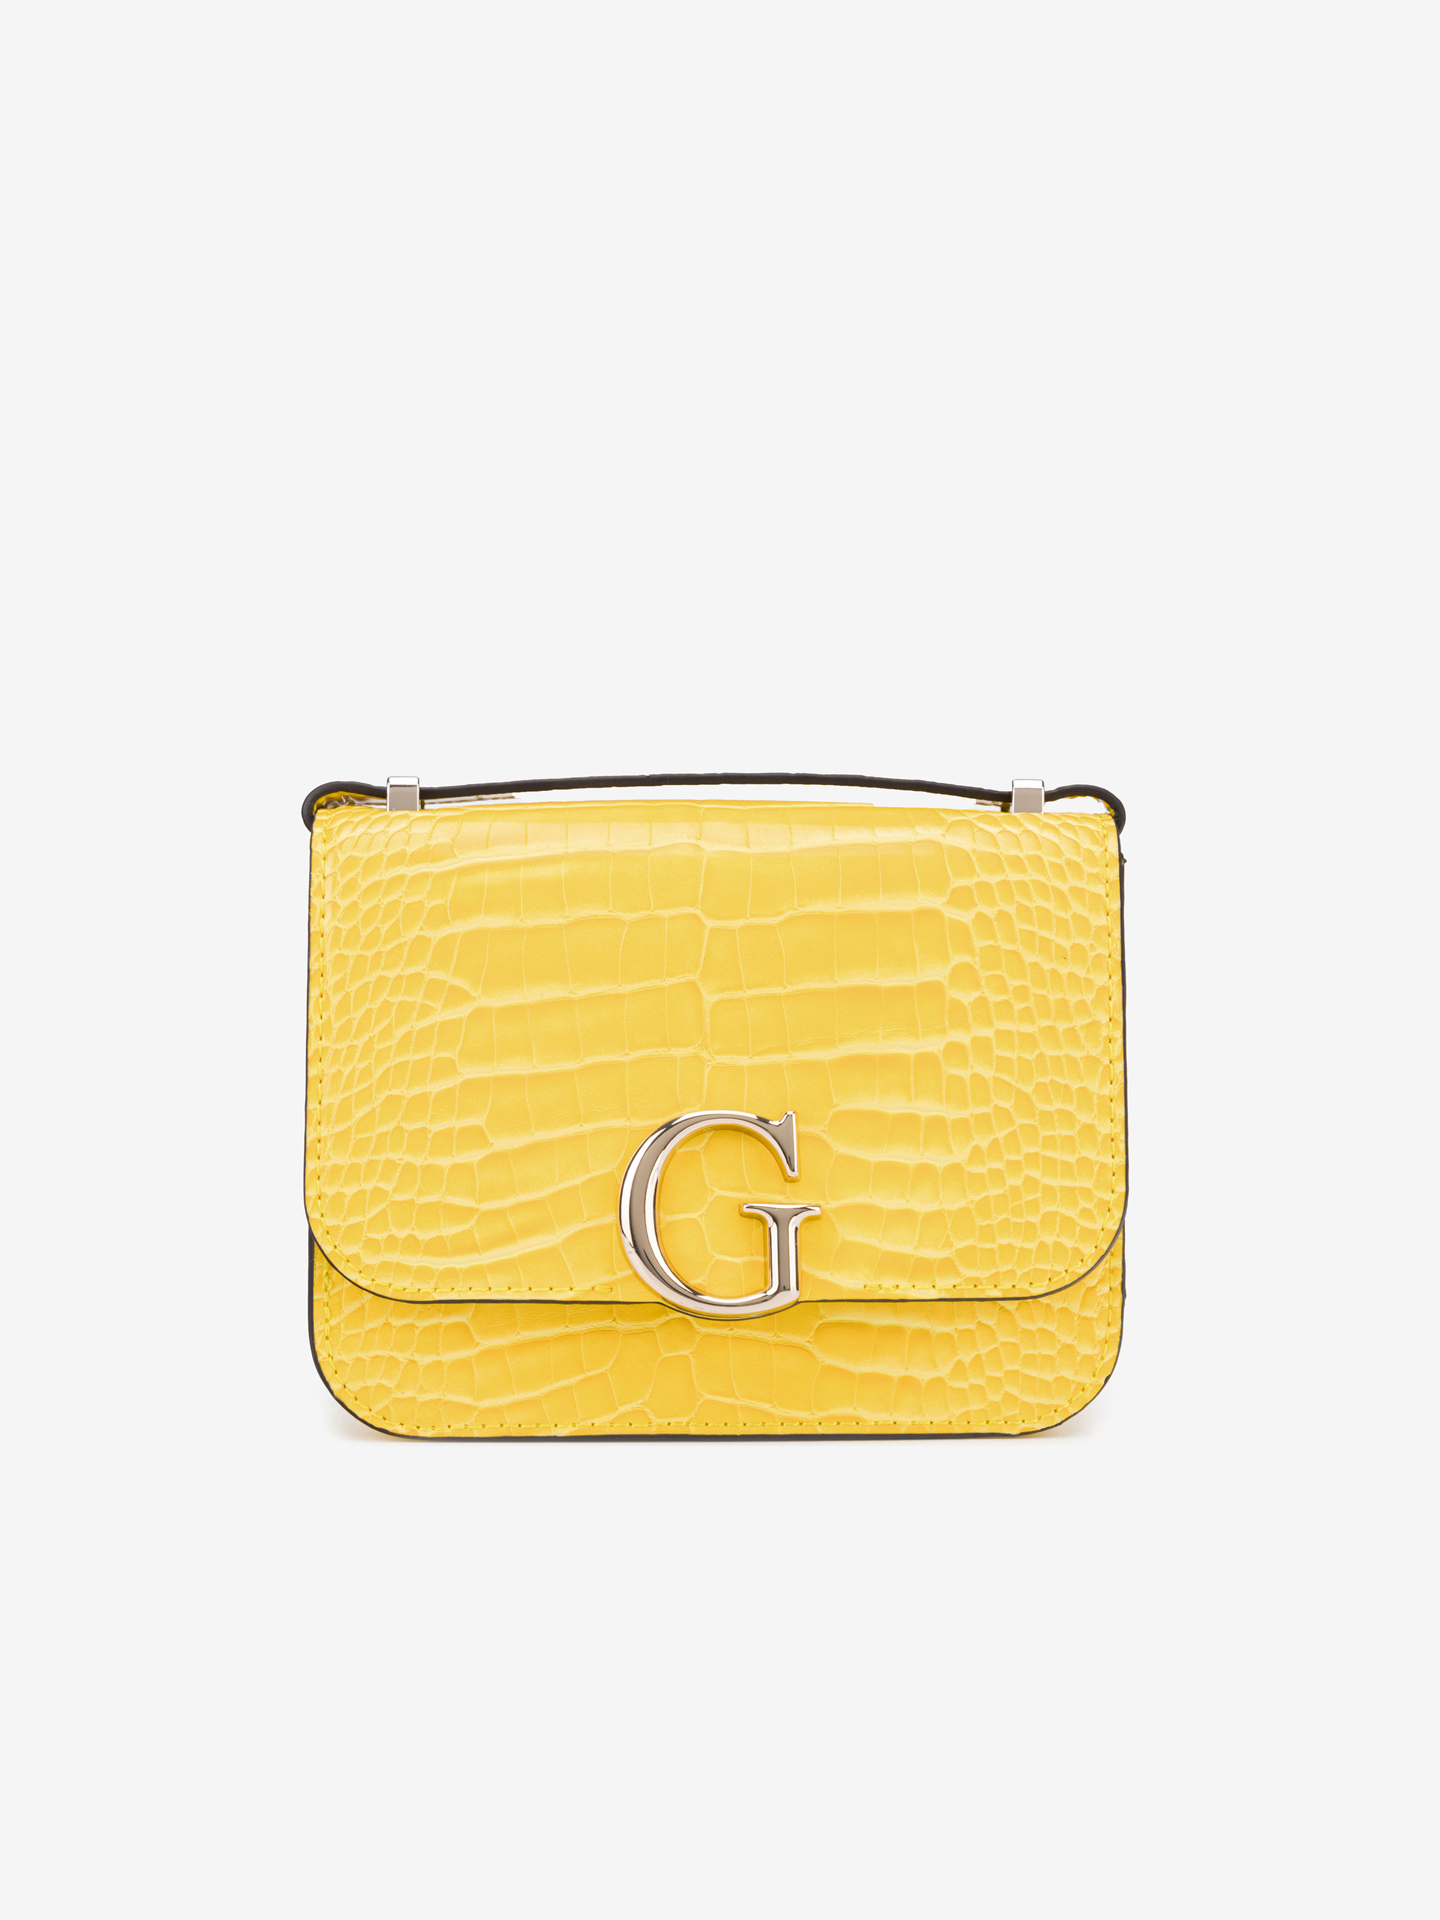 Guess yellow handbag Corily